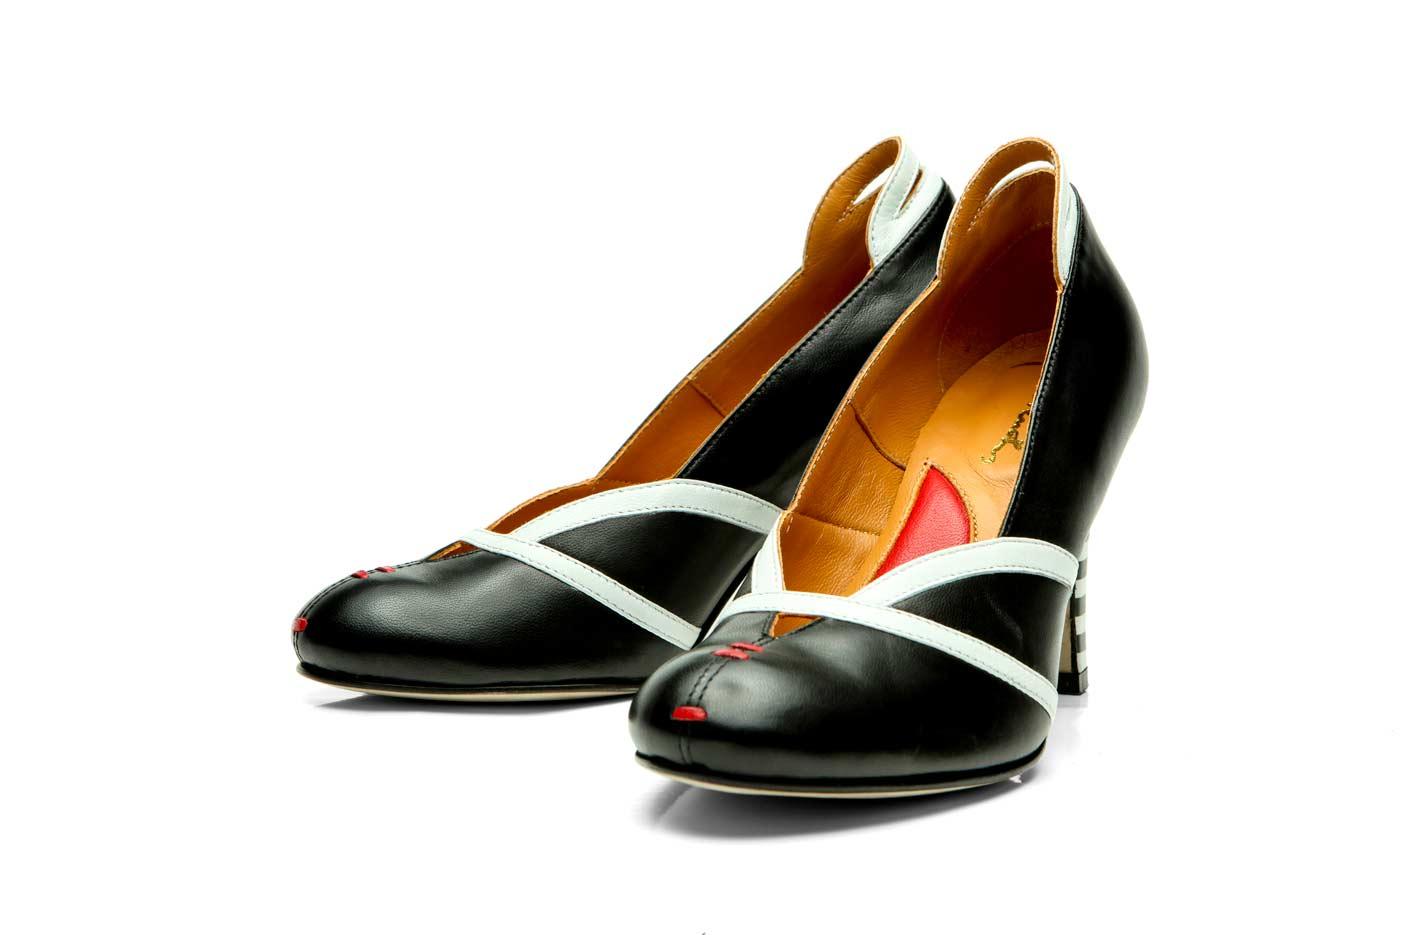 Black heels | Official Milenika shoes